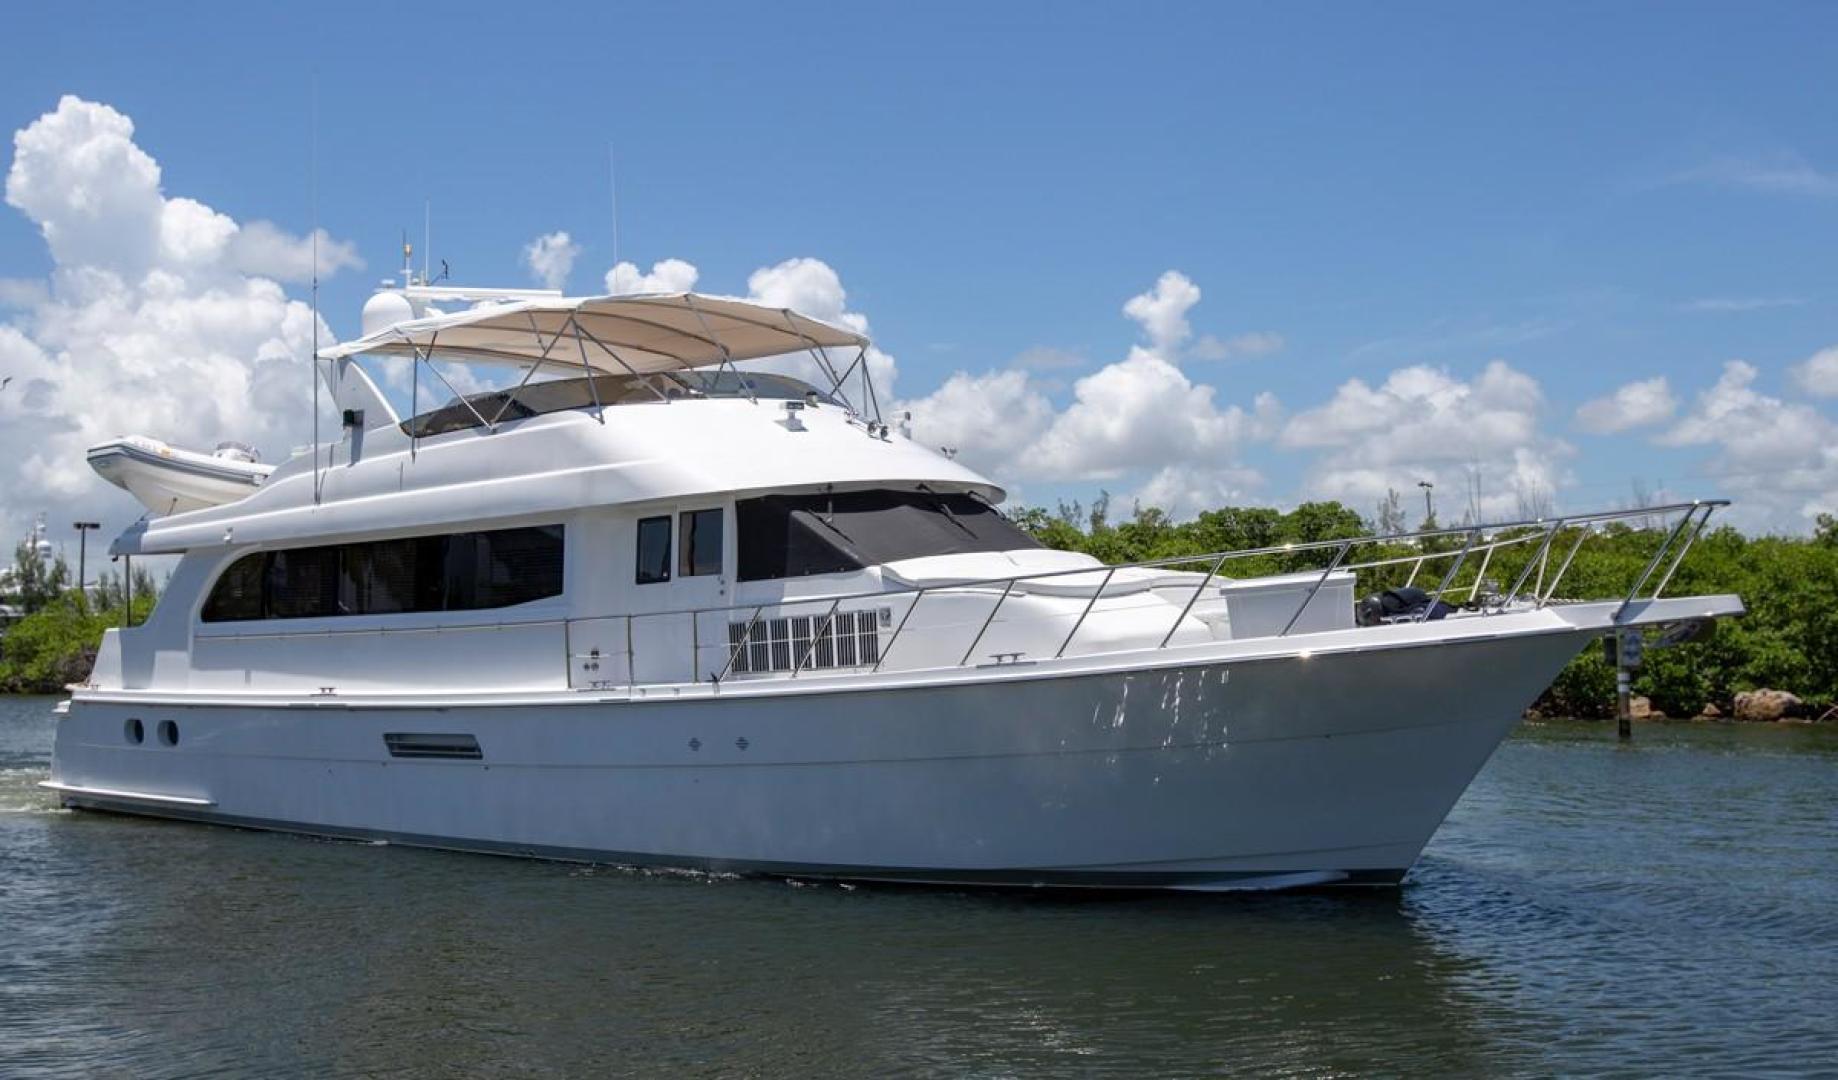 Hatteras-Cockpit Motor Yacht 2000-Getaway Ft. Lauderdale-Florida-United States-977361 | Thumbnail